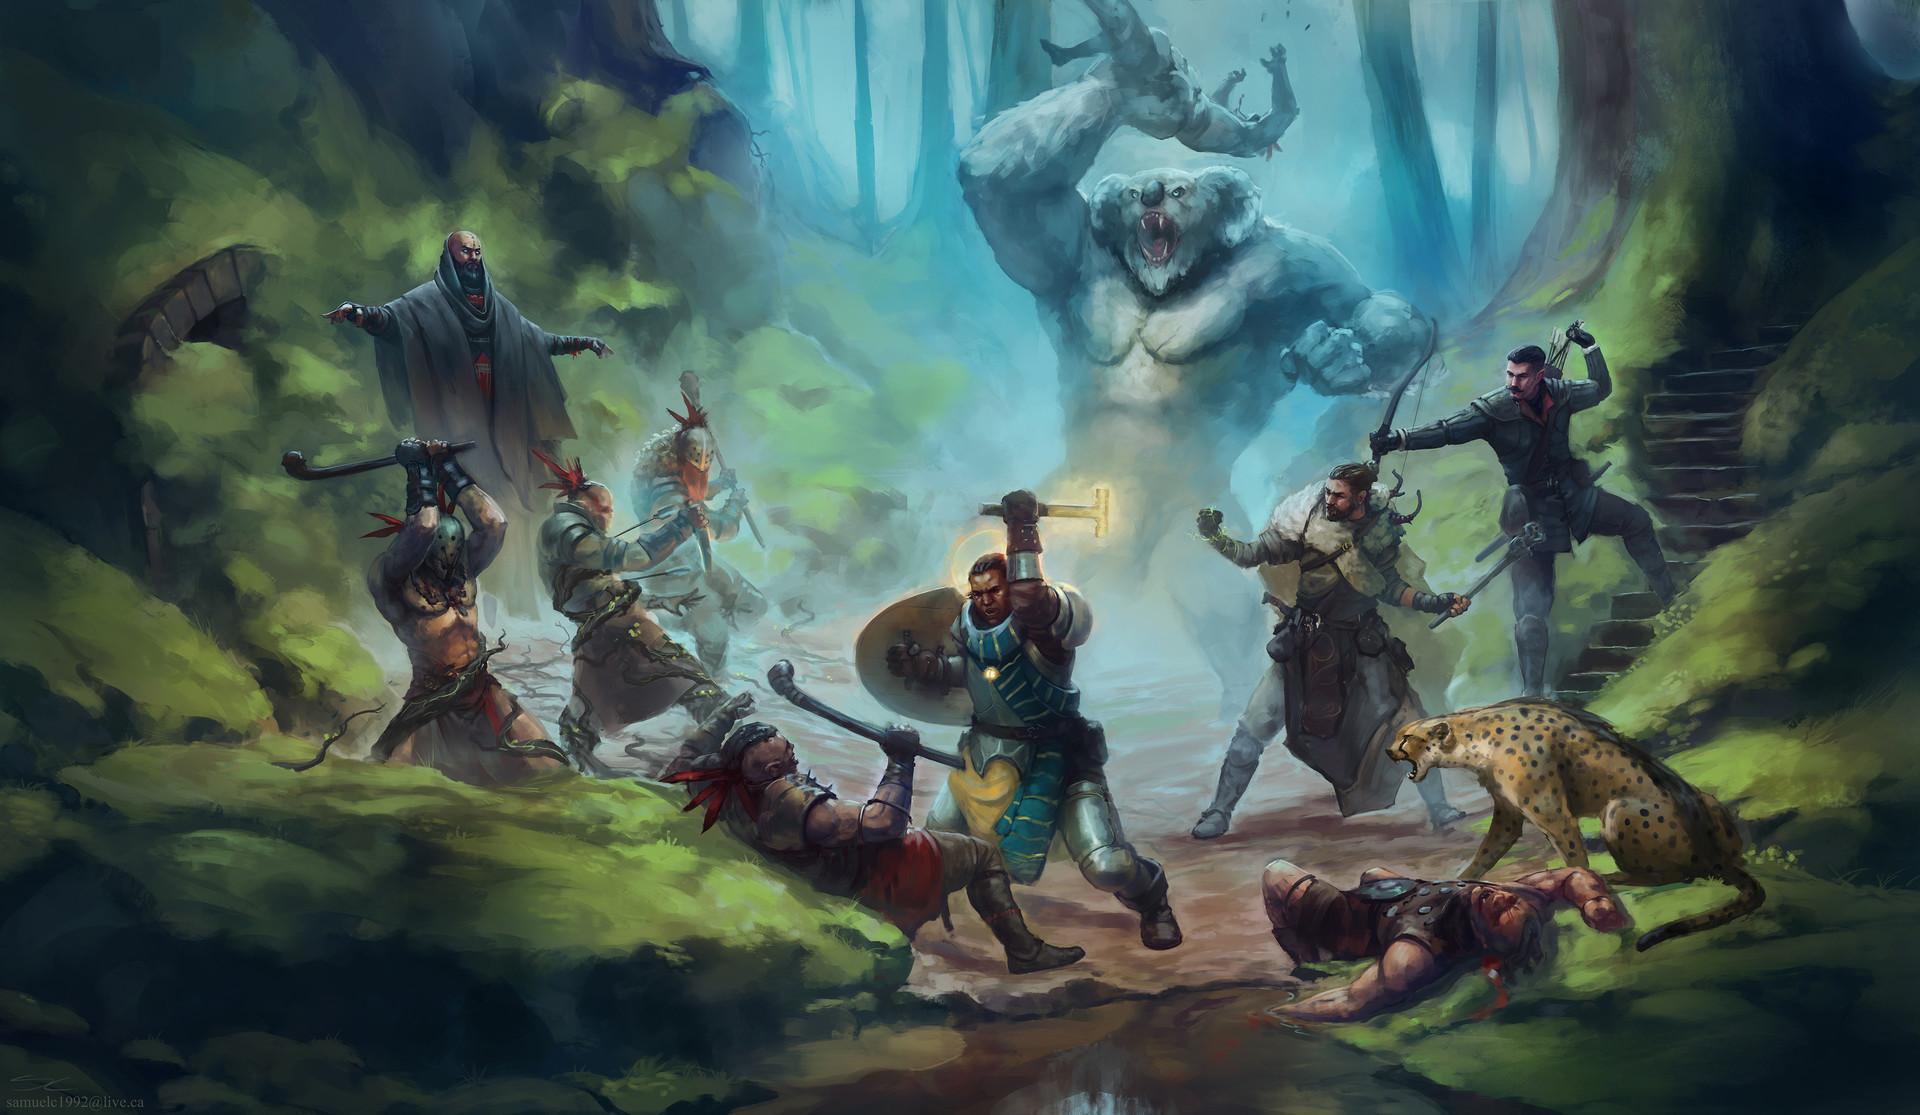 ArtStation - Dnd Battle, Samuel Couture